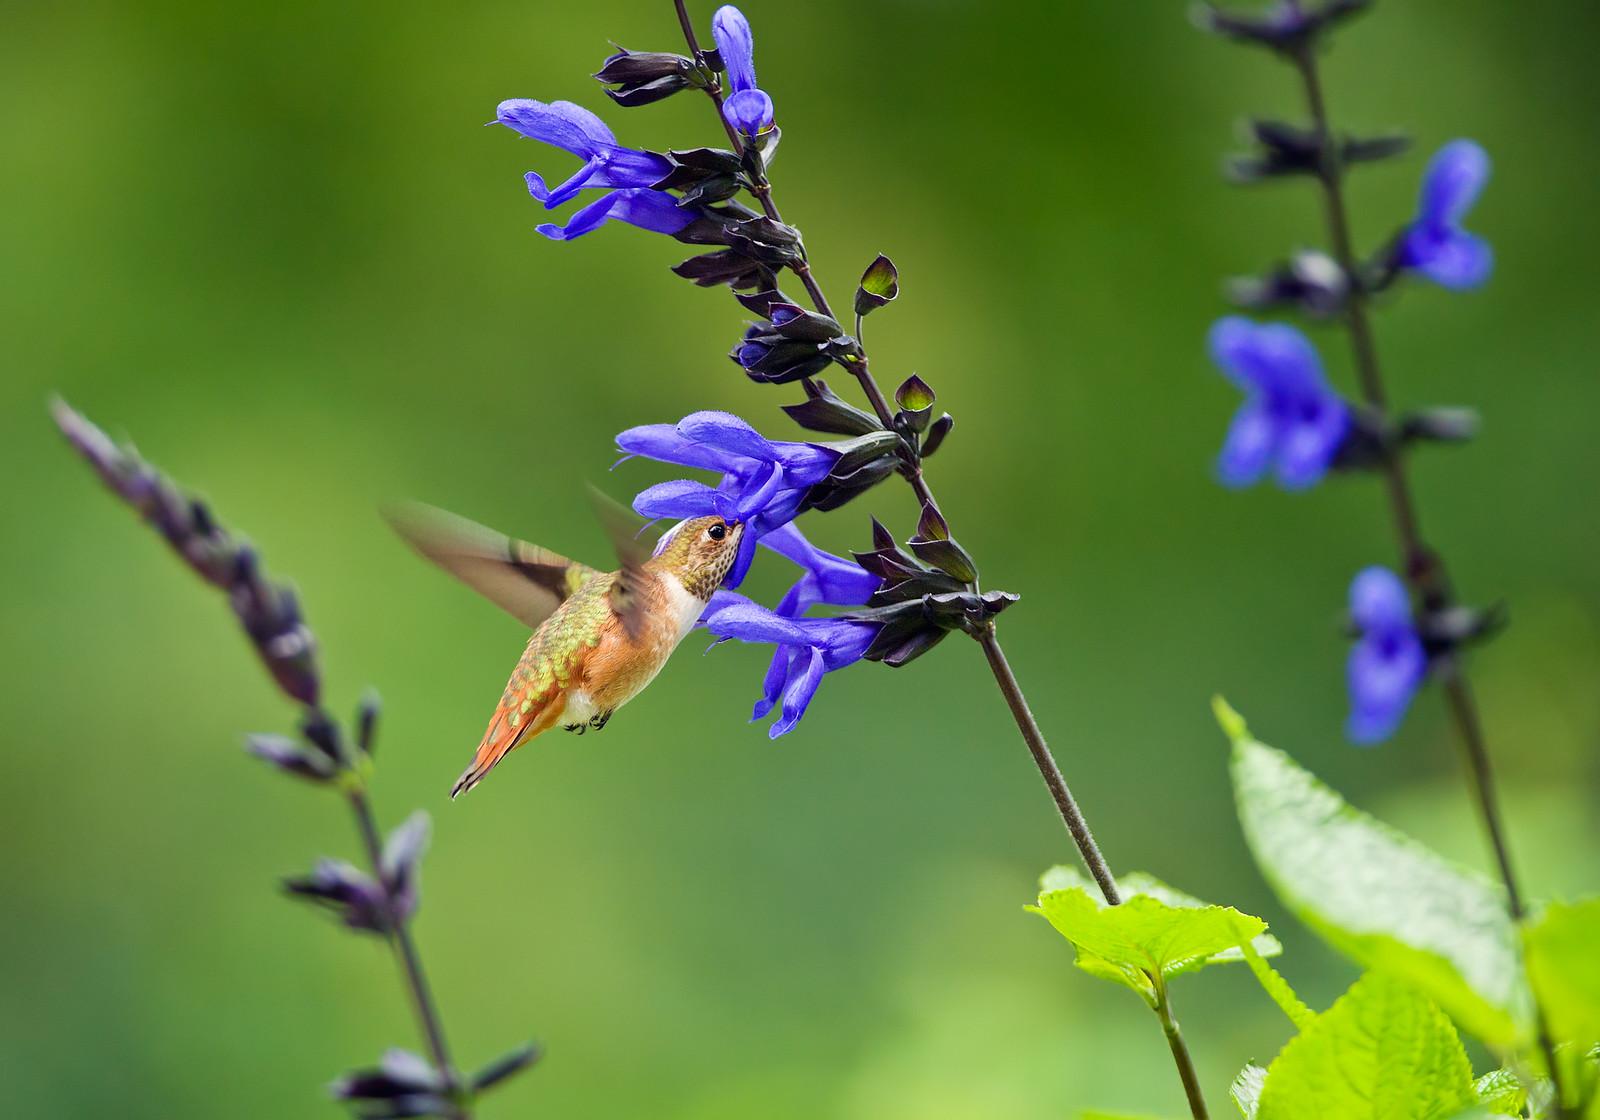 Hummingbird flash photography